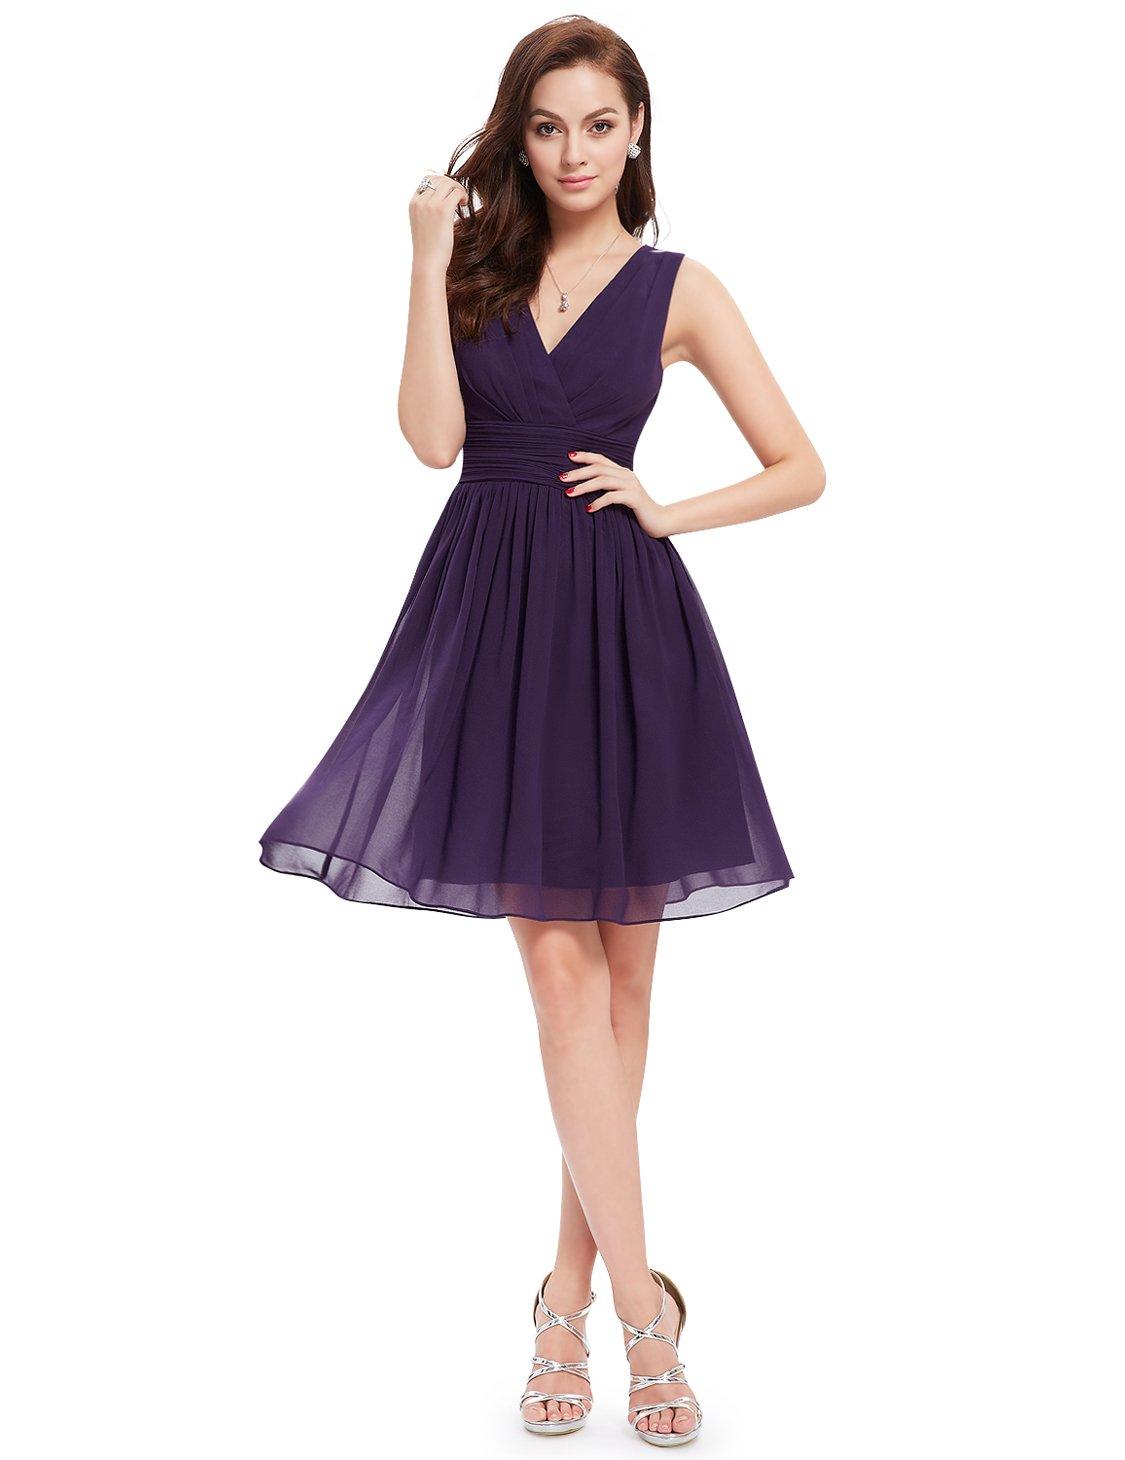 Alisapan Womens V-Neck Chiffon Short Bridesmaid Summer Party Wedding Dresses for Guests 3989